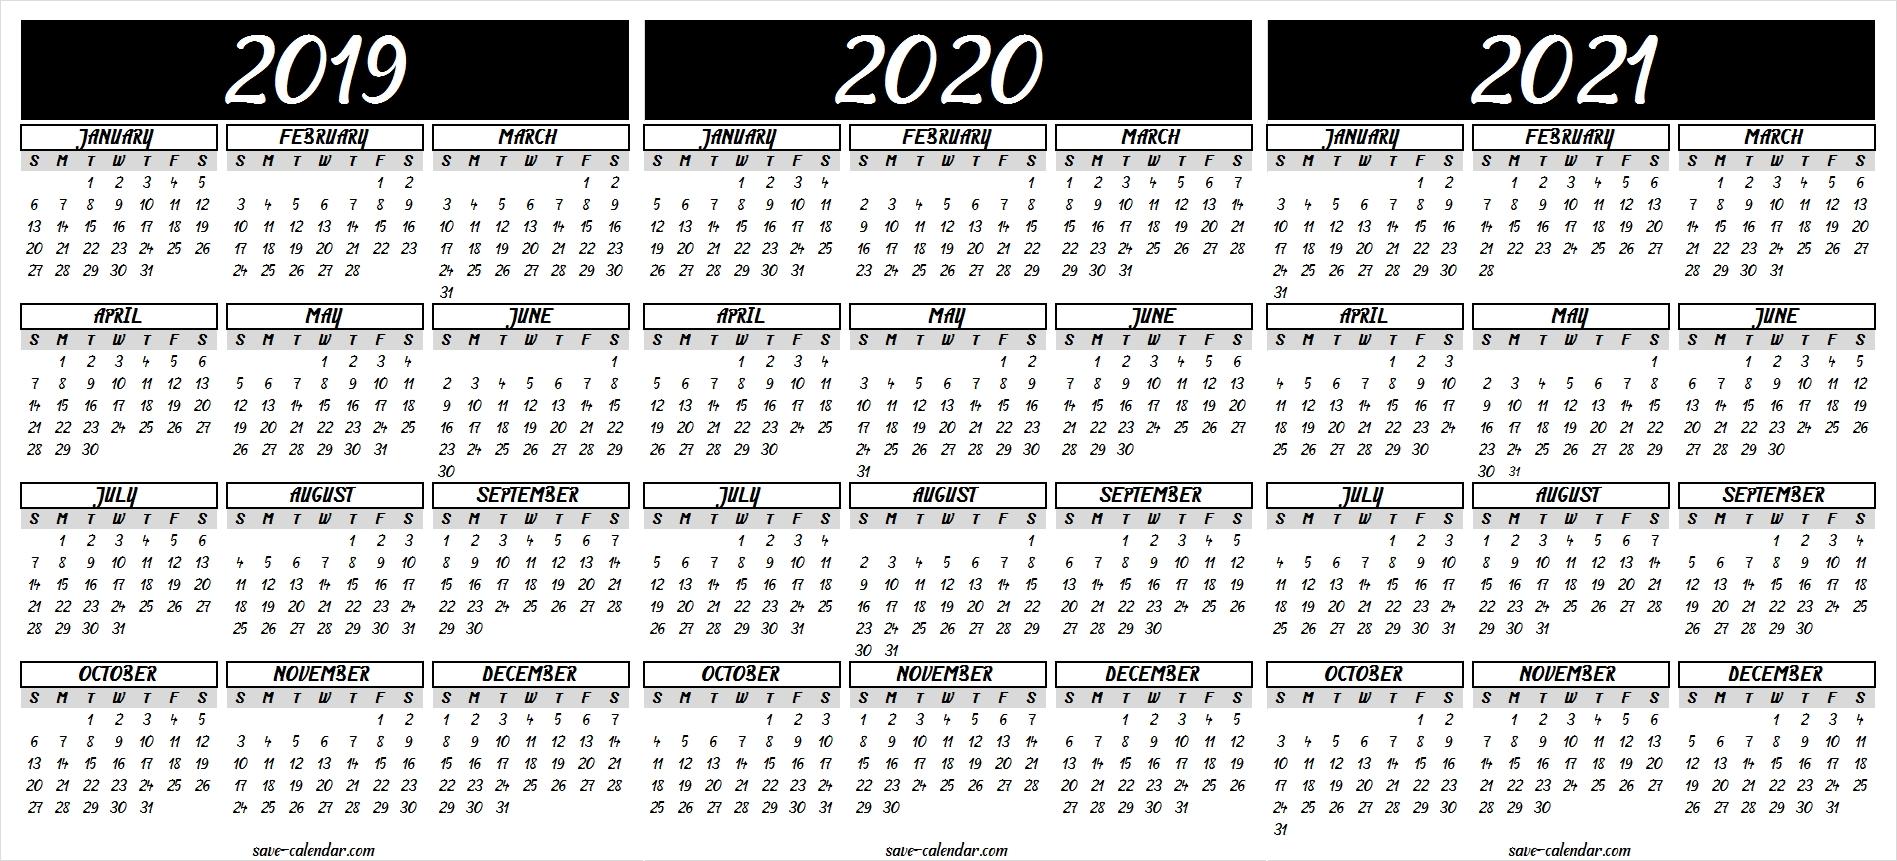 2019 2020 2021 calendar printable | 2021 calendar, calendar